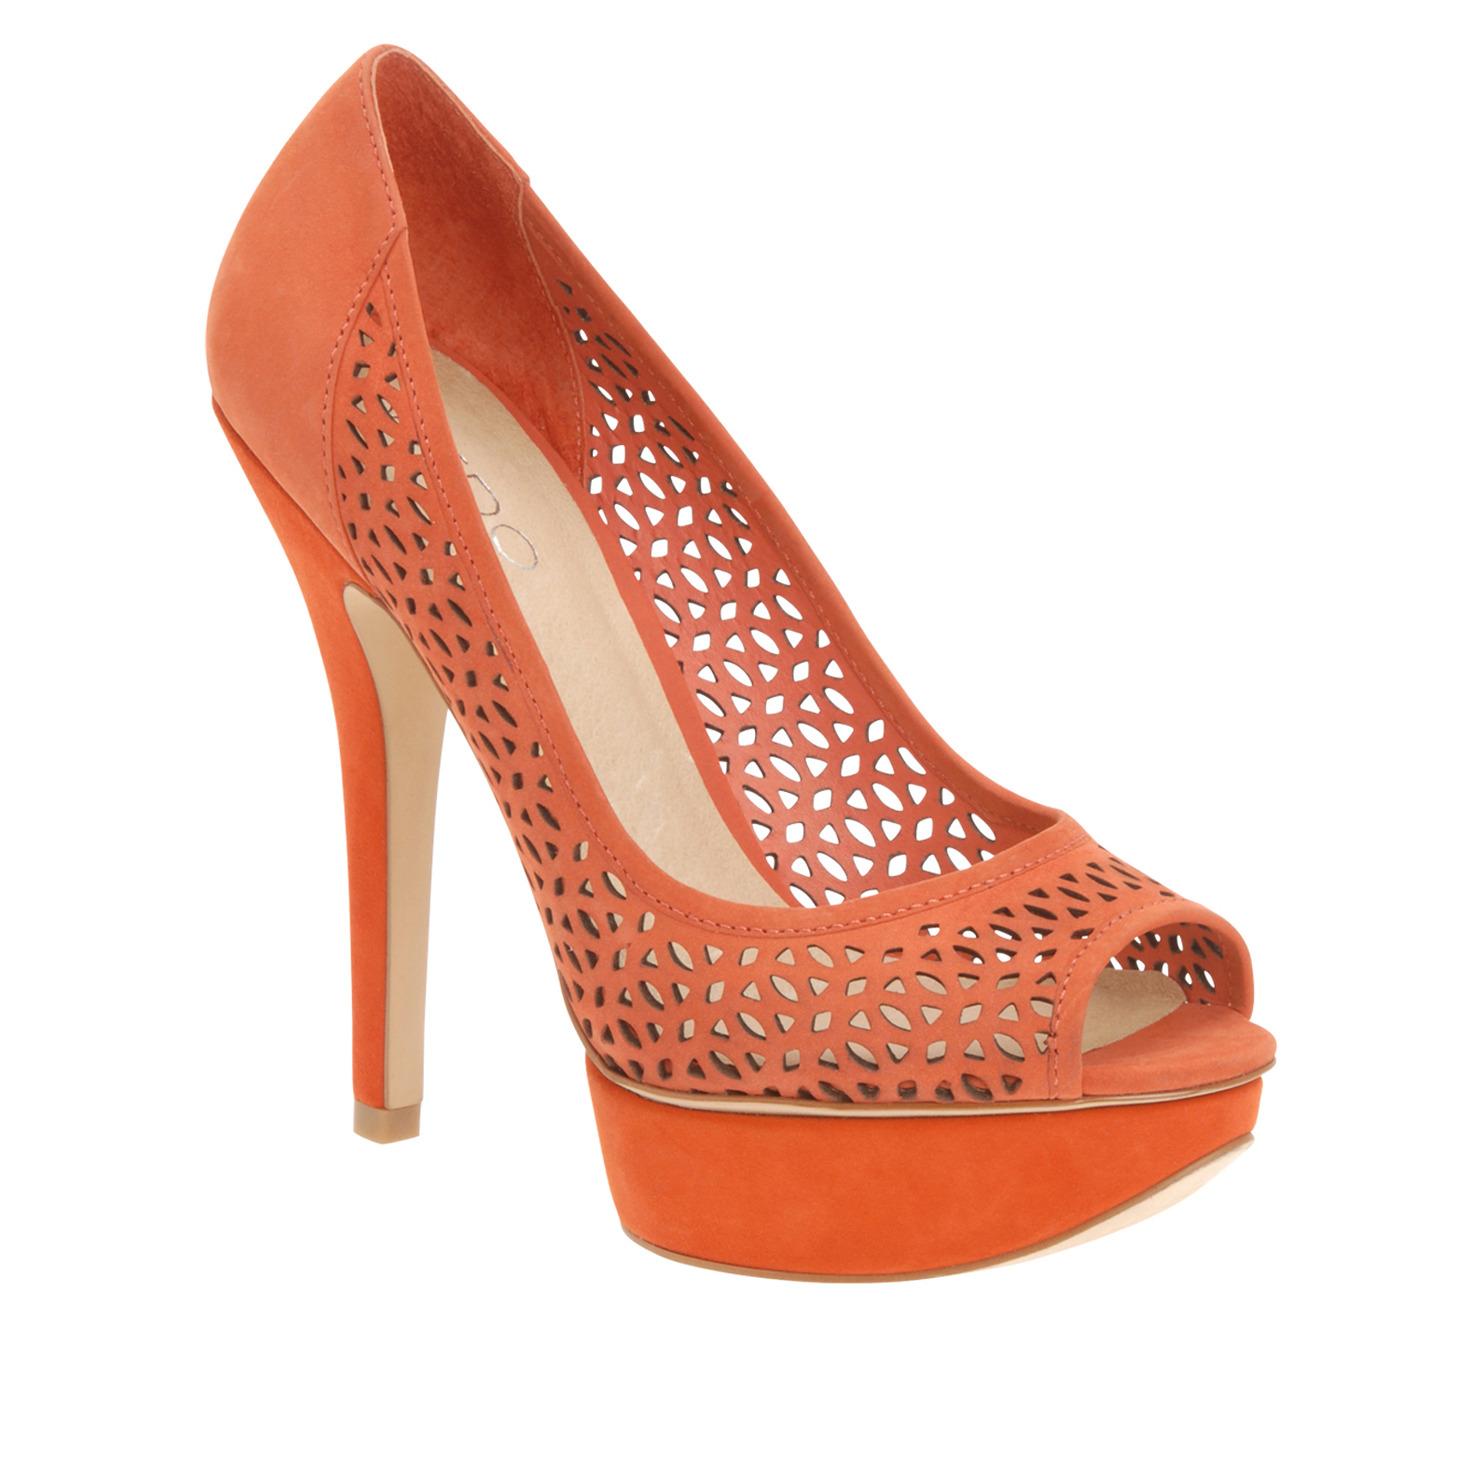 aldo platform shoes missethnicity